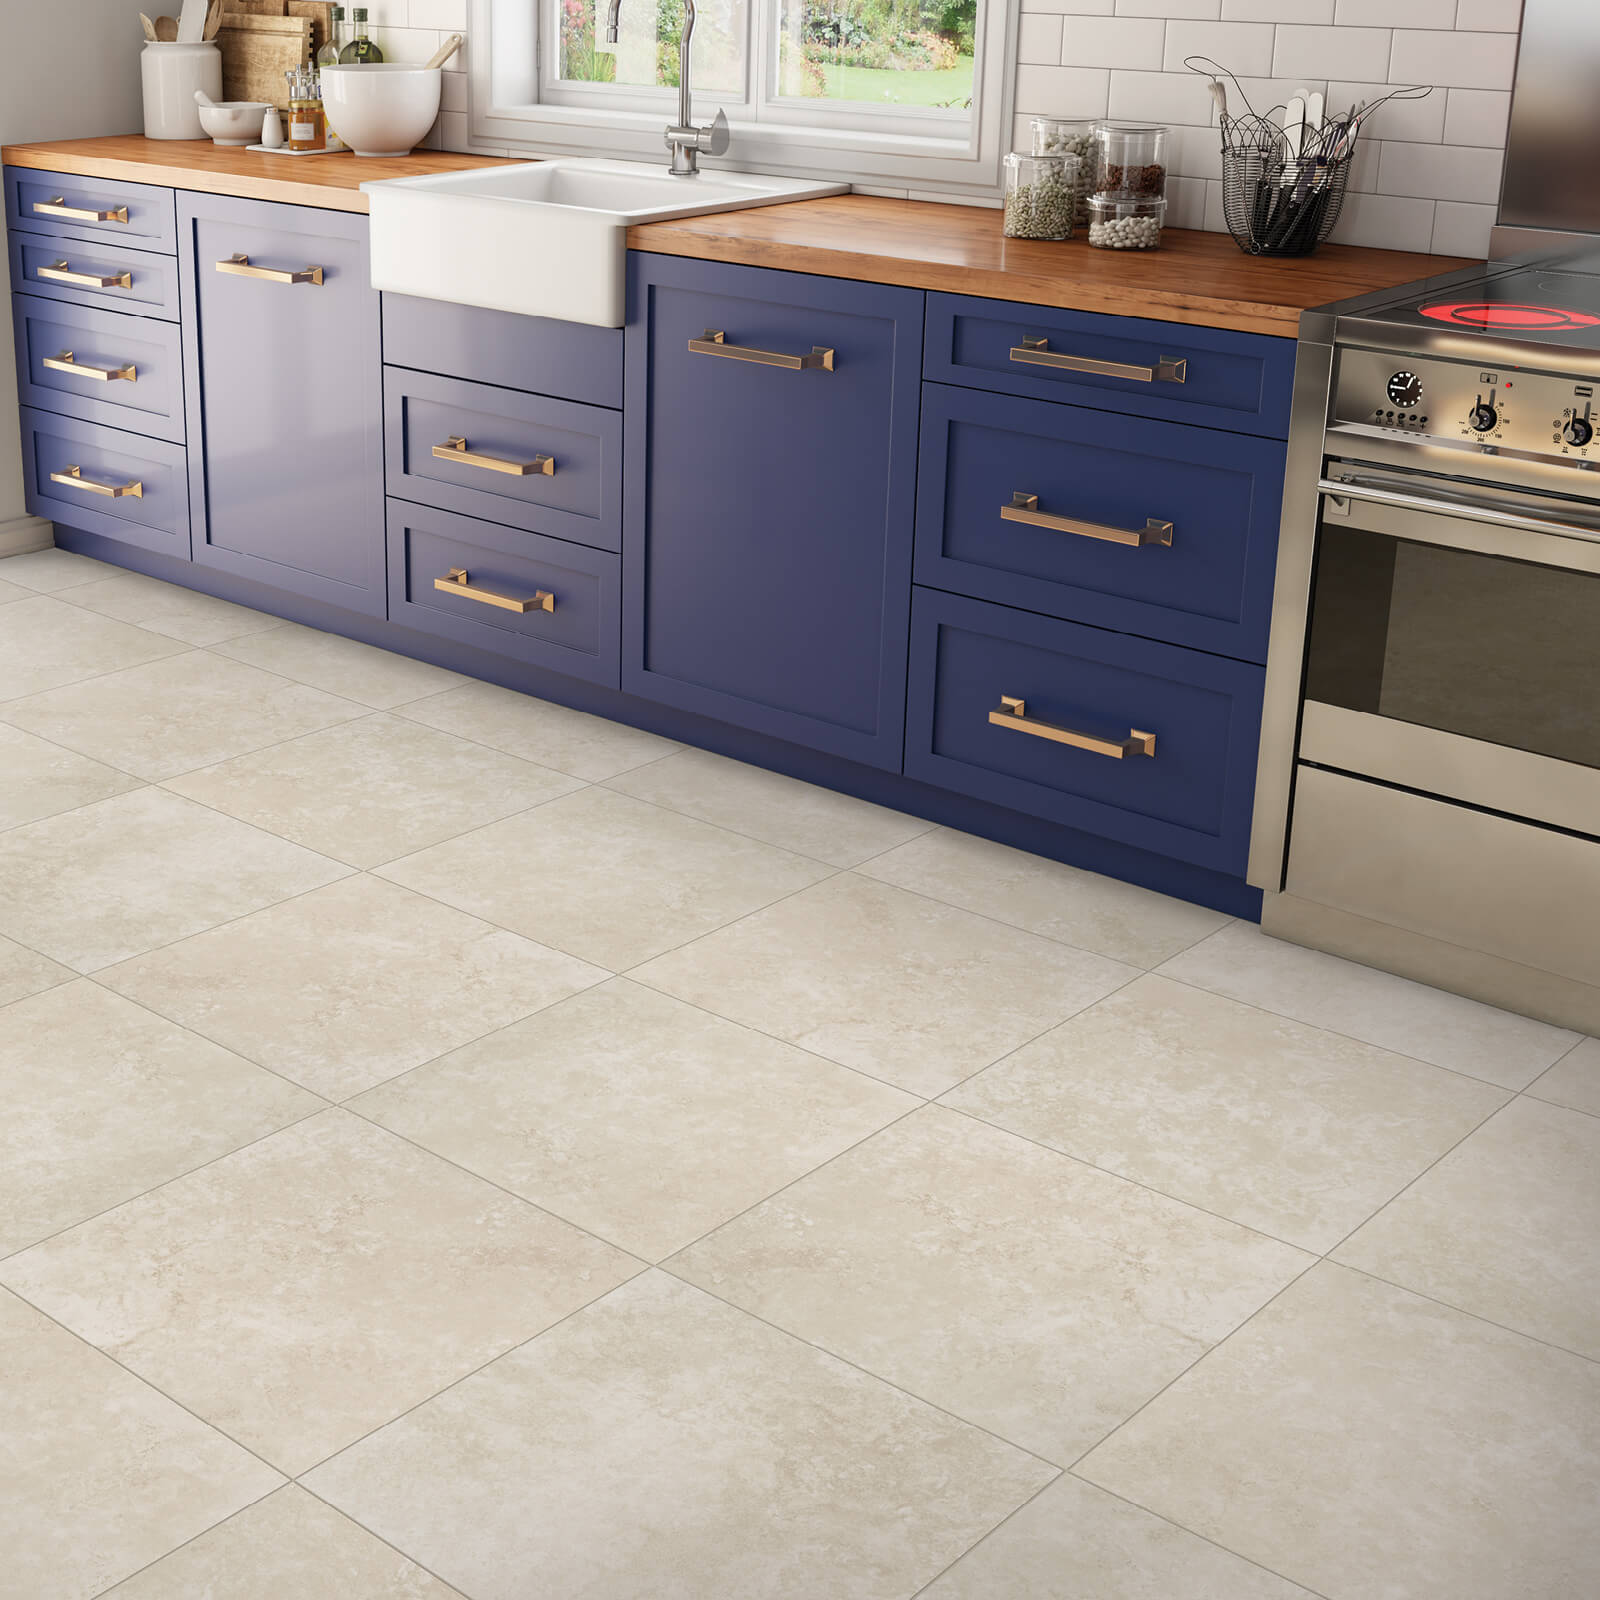 Kitchen interior | McSwain Carpet & Floors